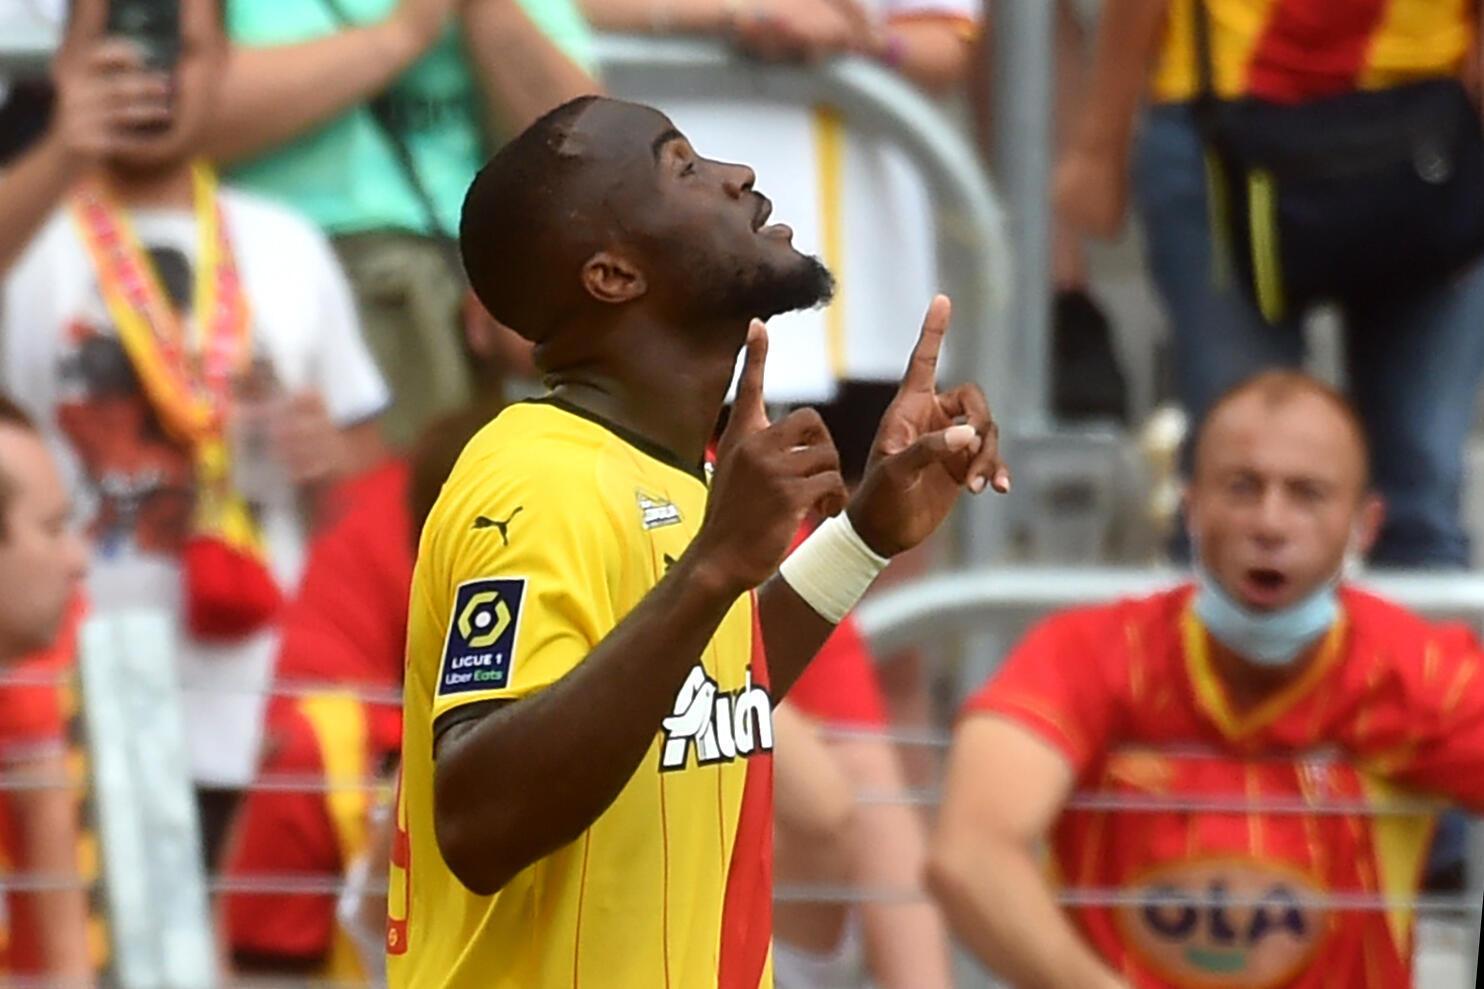 Striker Kamerun dari Lens, Ignatius Knebe Ganabo, setelah bermain imbang melawan Saint-Etienne di kandang, pada putaran kedua L1, 15 Agustus 2021 di Stade Bolert-Delice.